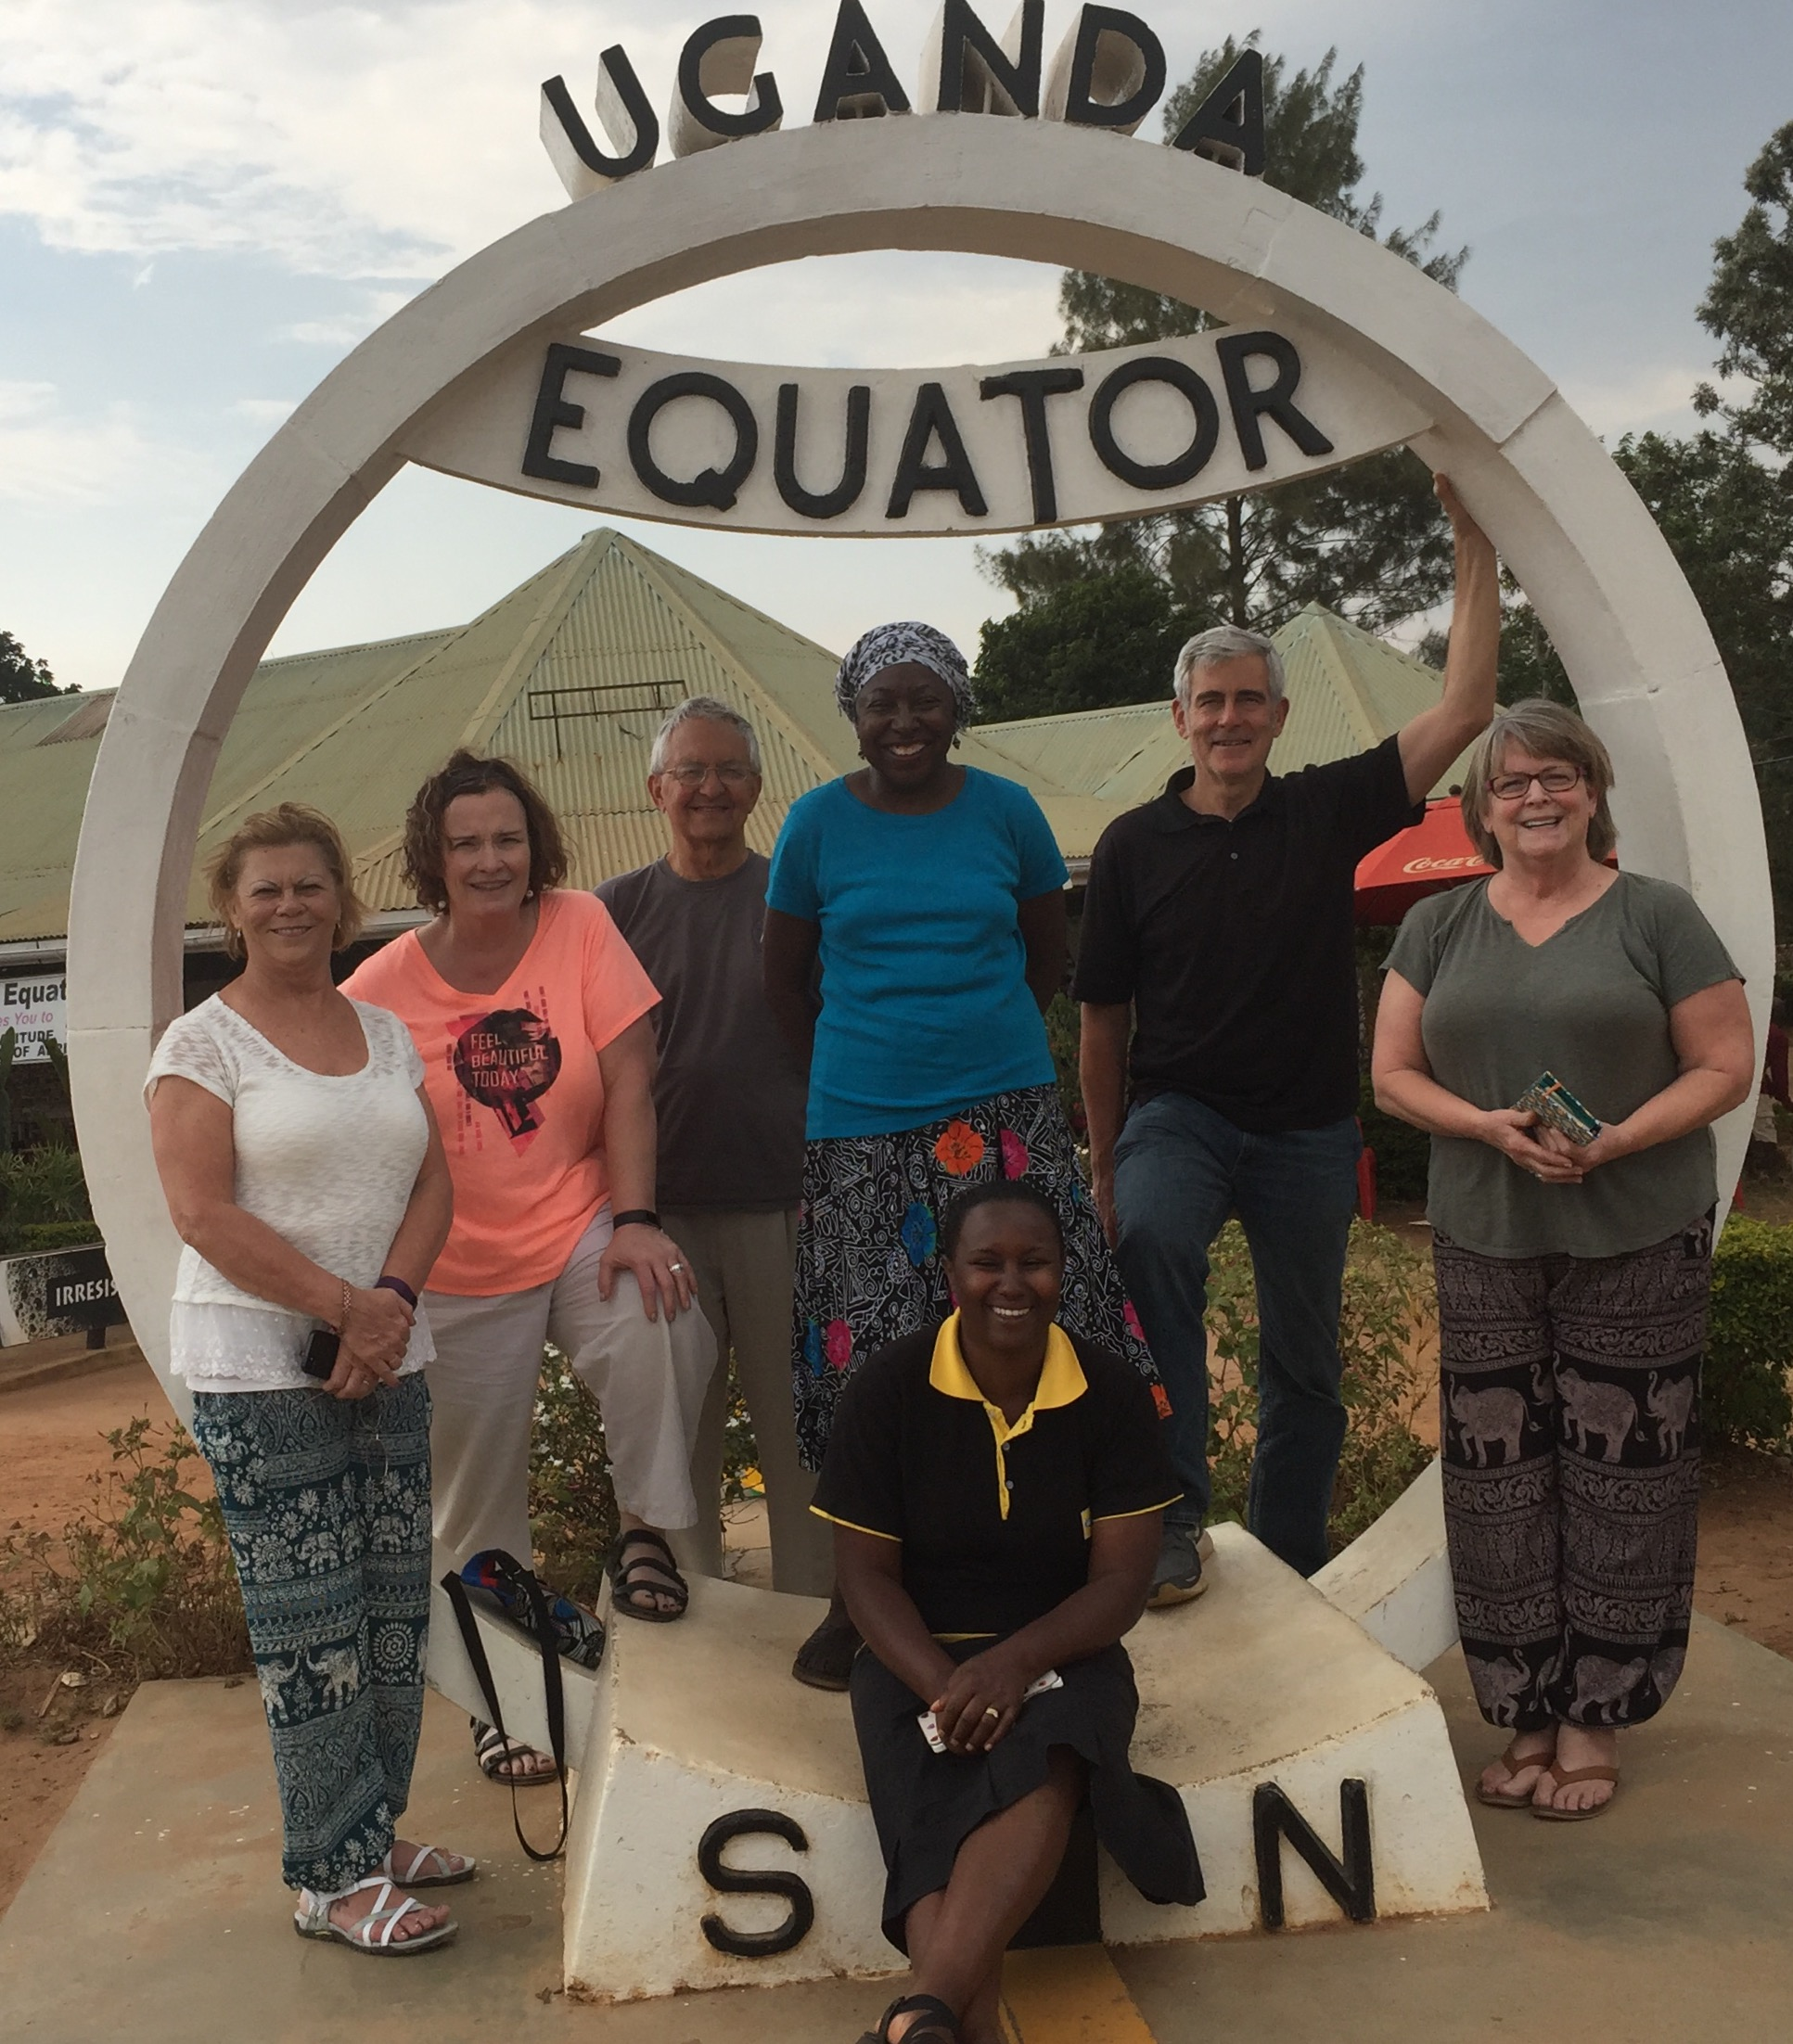 Equator group pic.jpg